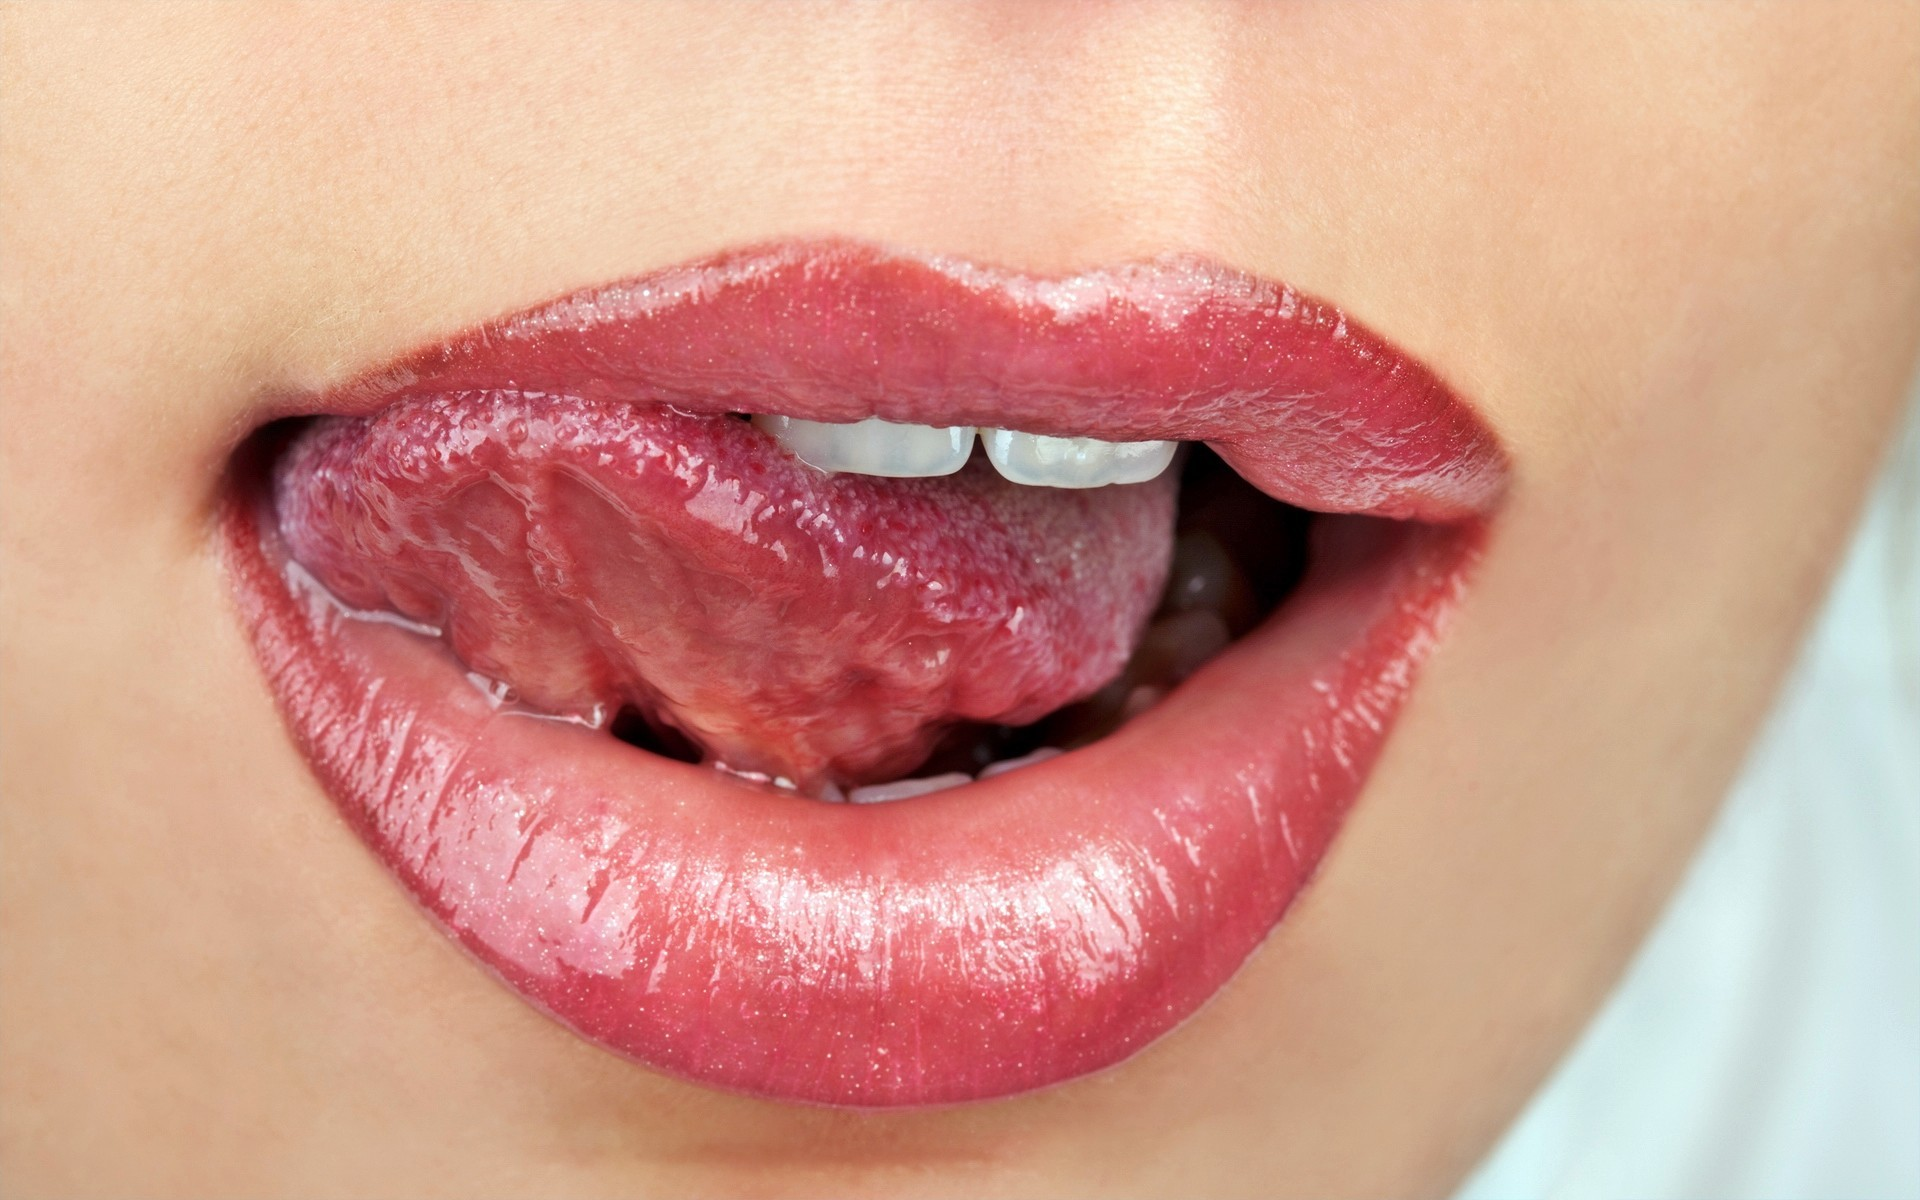 lips-mouth-saliva-tongue-2525380-1920x1200.jpg